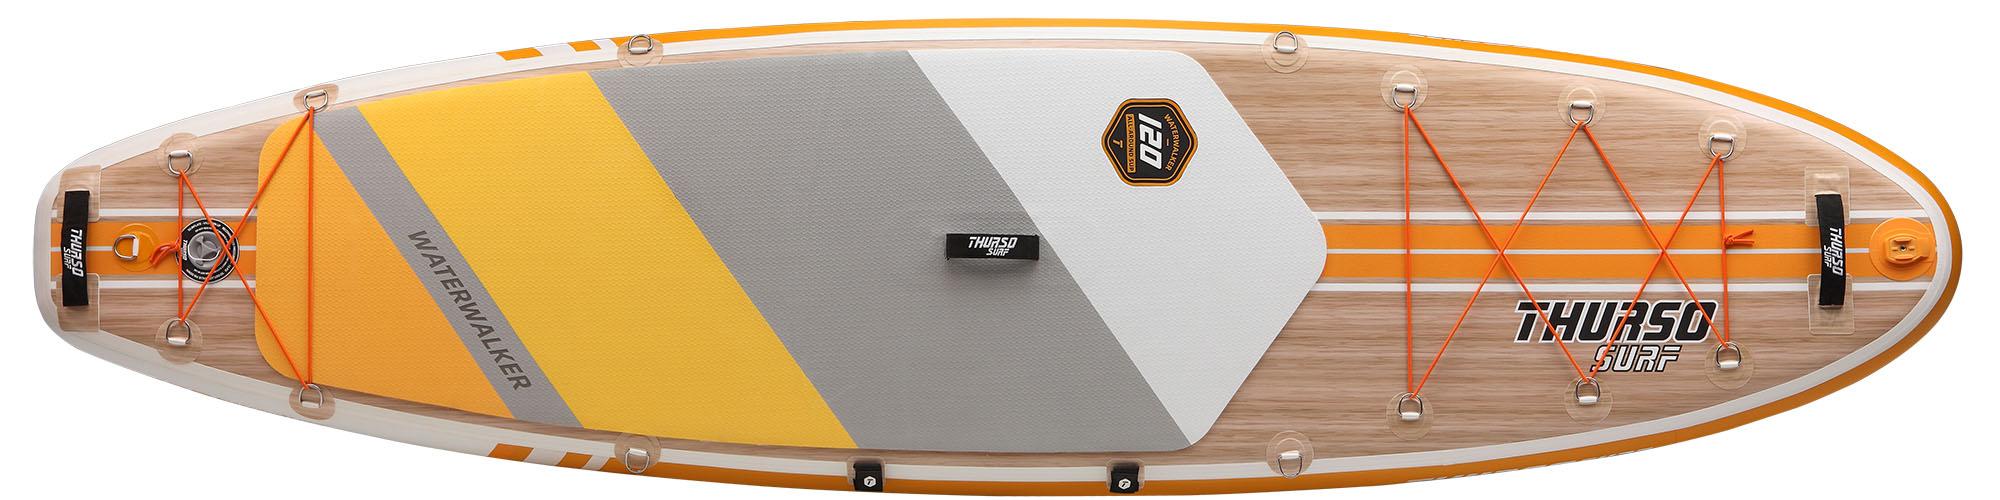 stand-up-paddle-board-waterwalker-120-tangerine-thurso-surf-horizontal-2000.jpg